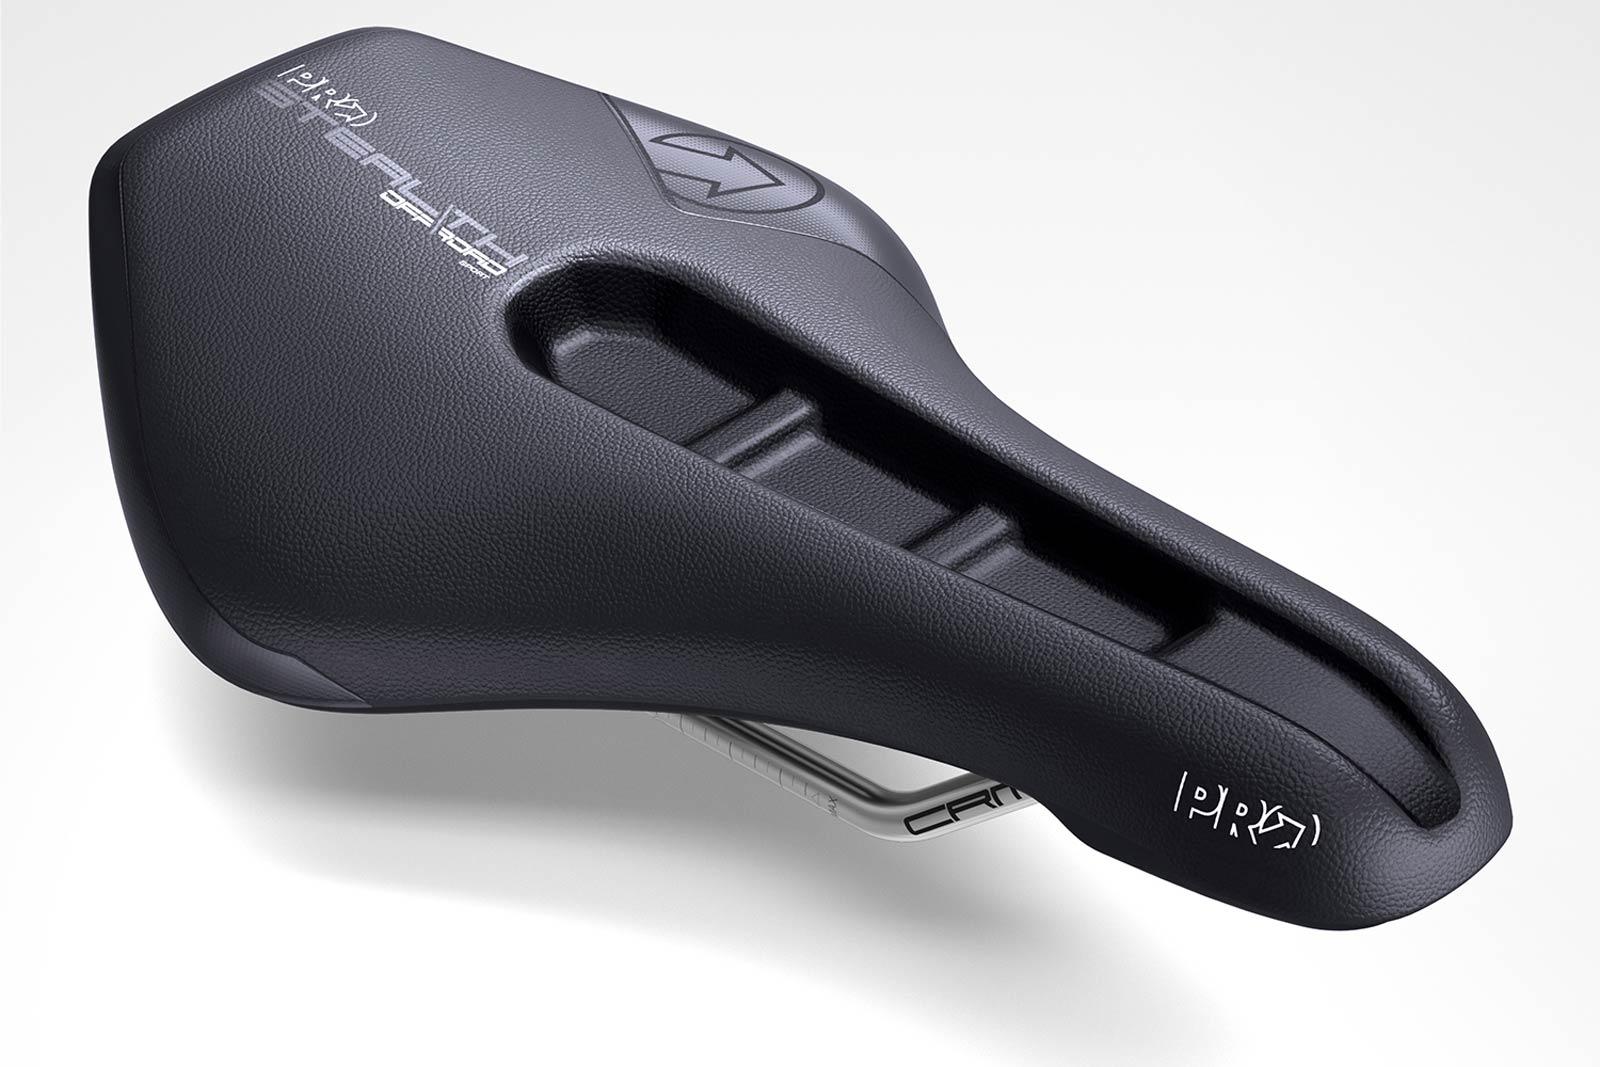 pro stealth off-road sport gravel mtb saddle